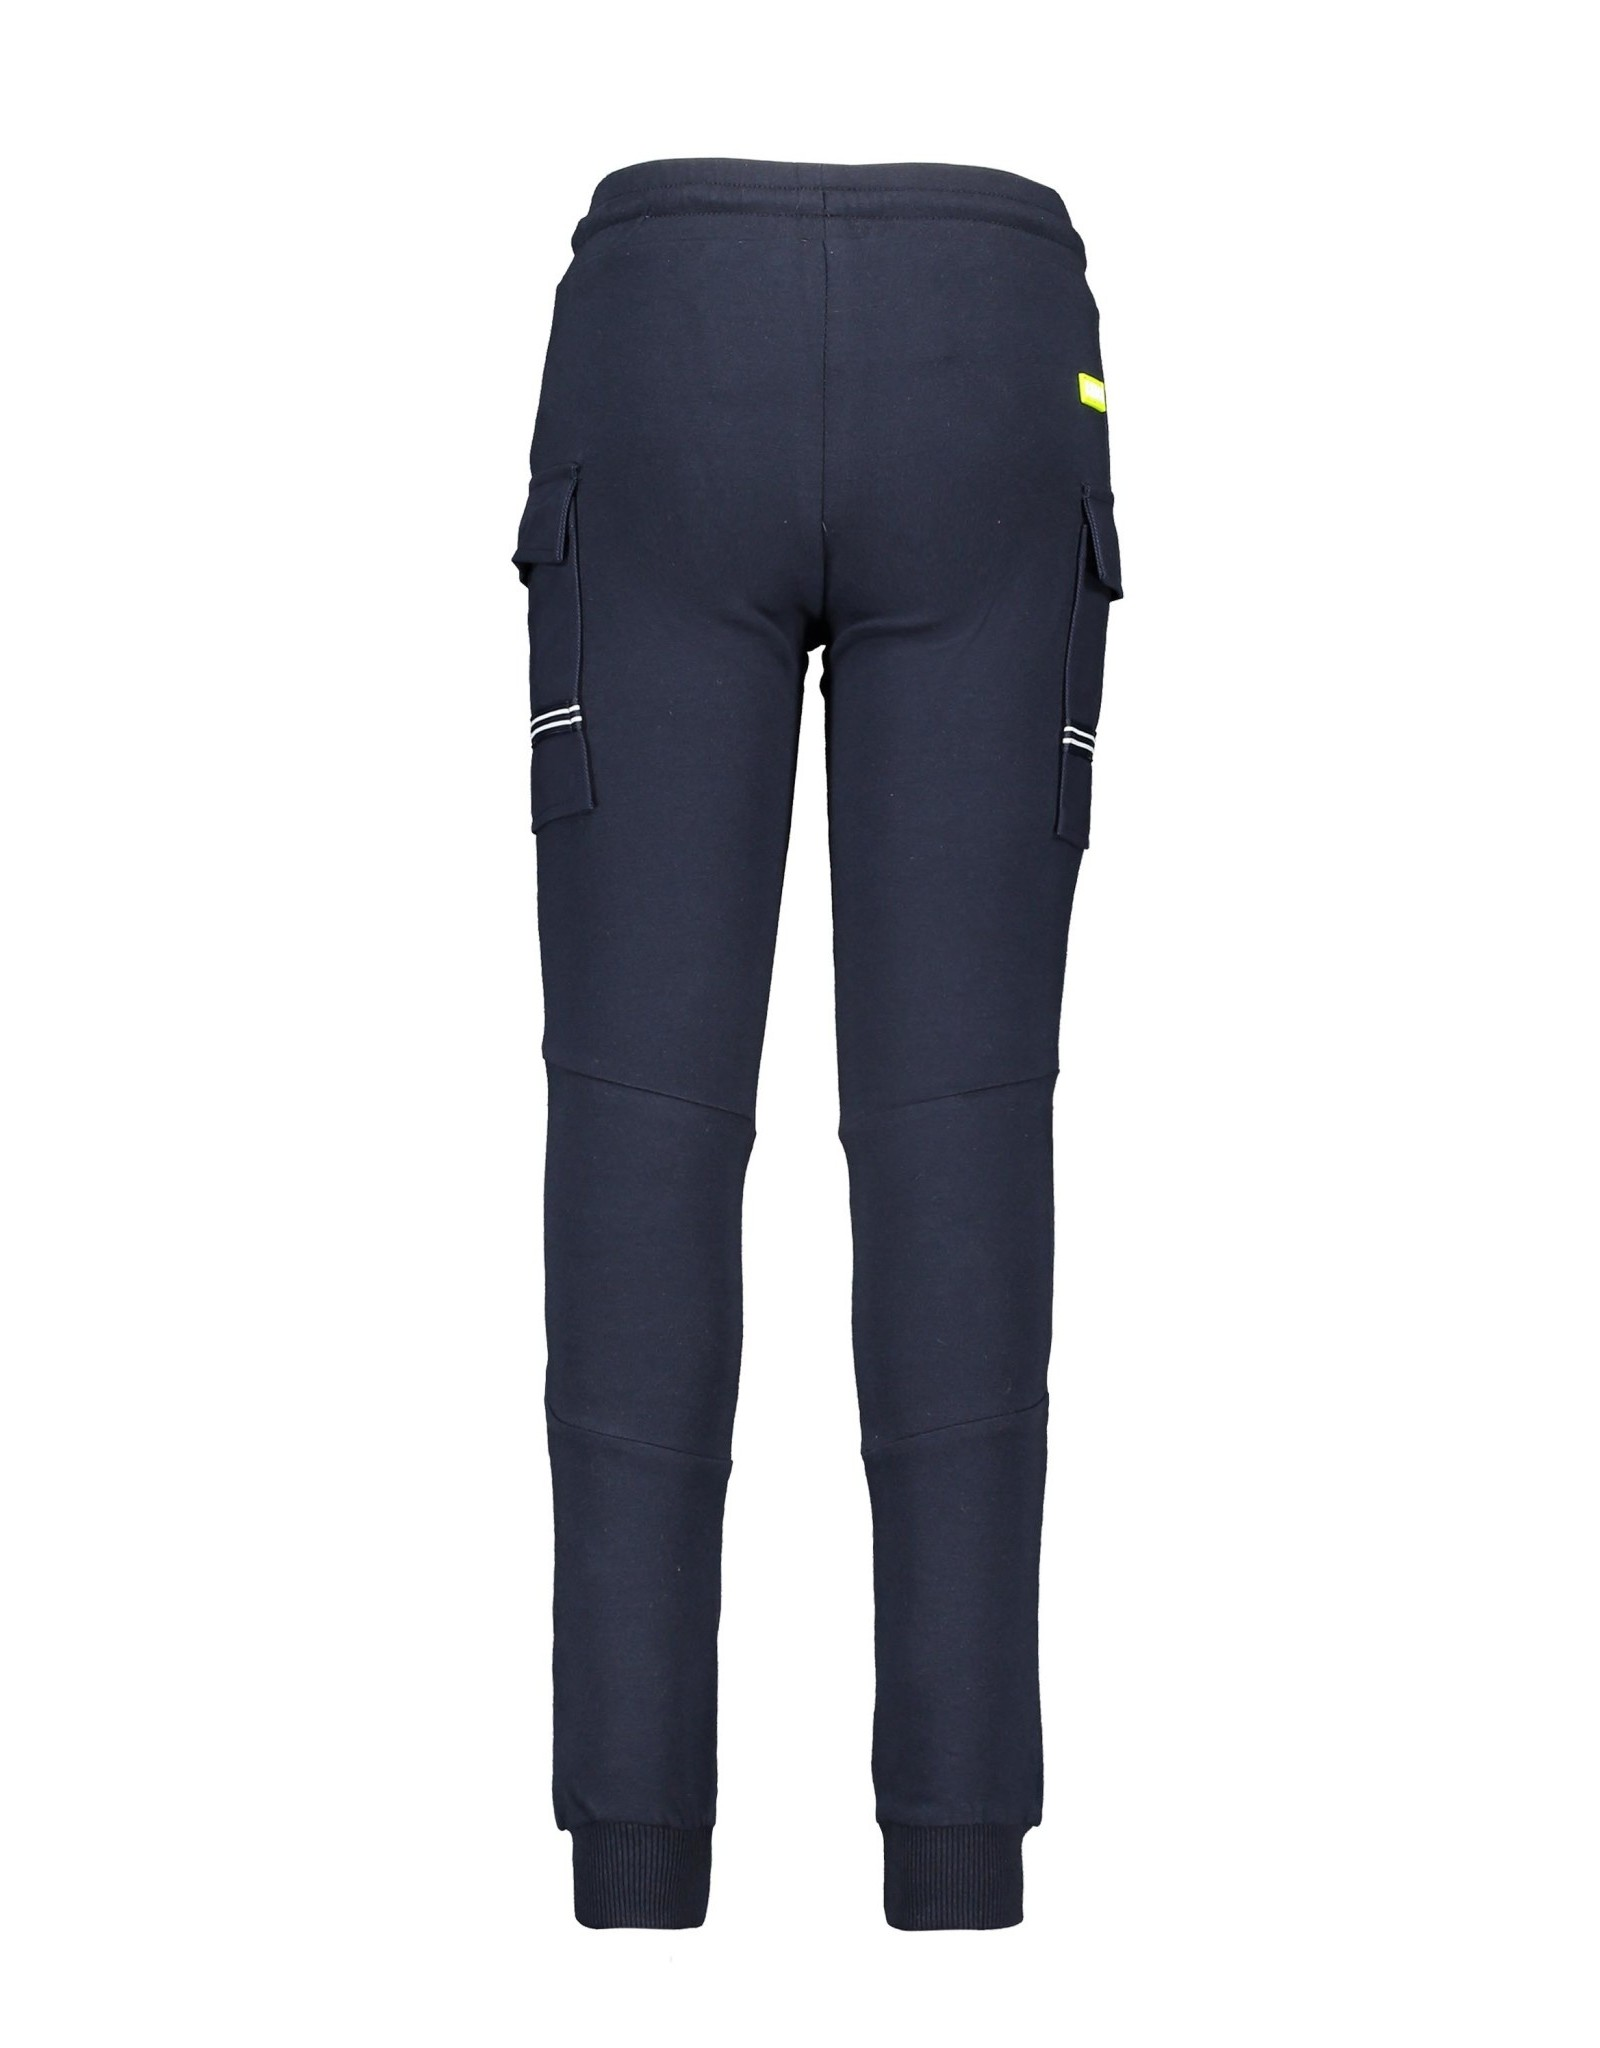 B.Nosy B.Nosy jongens joggingbroek Oxford Blue S21